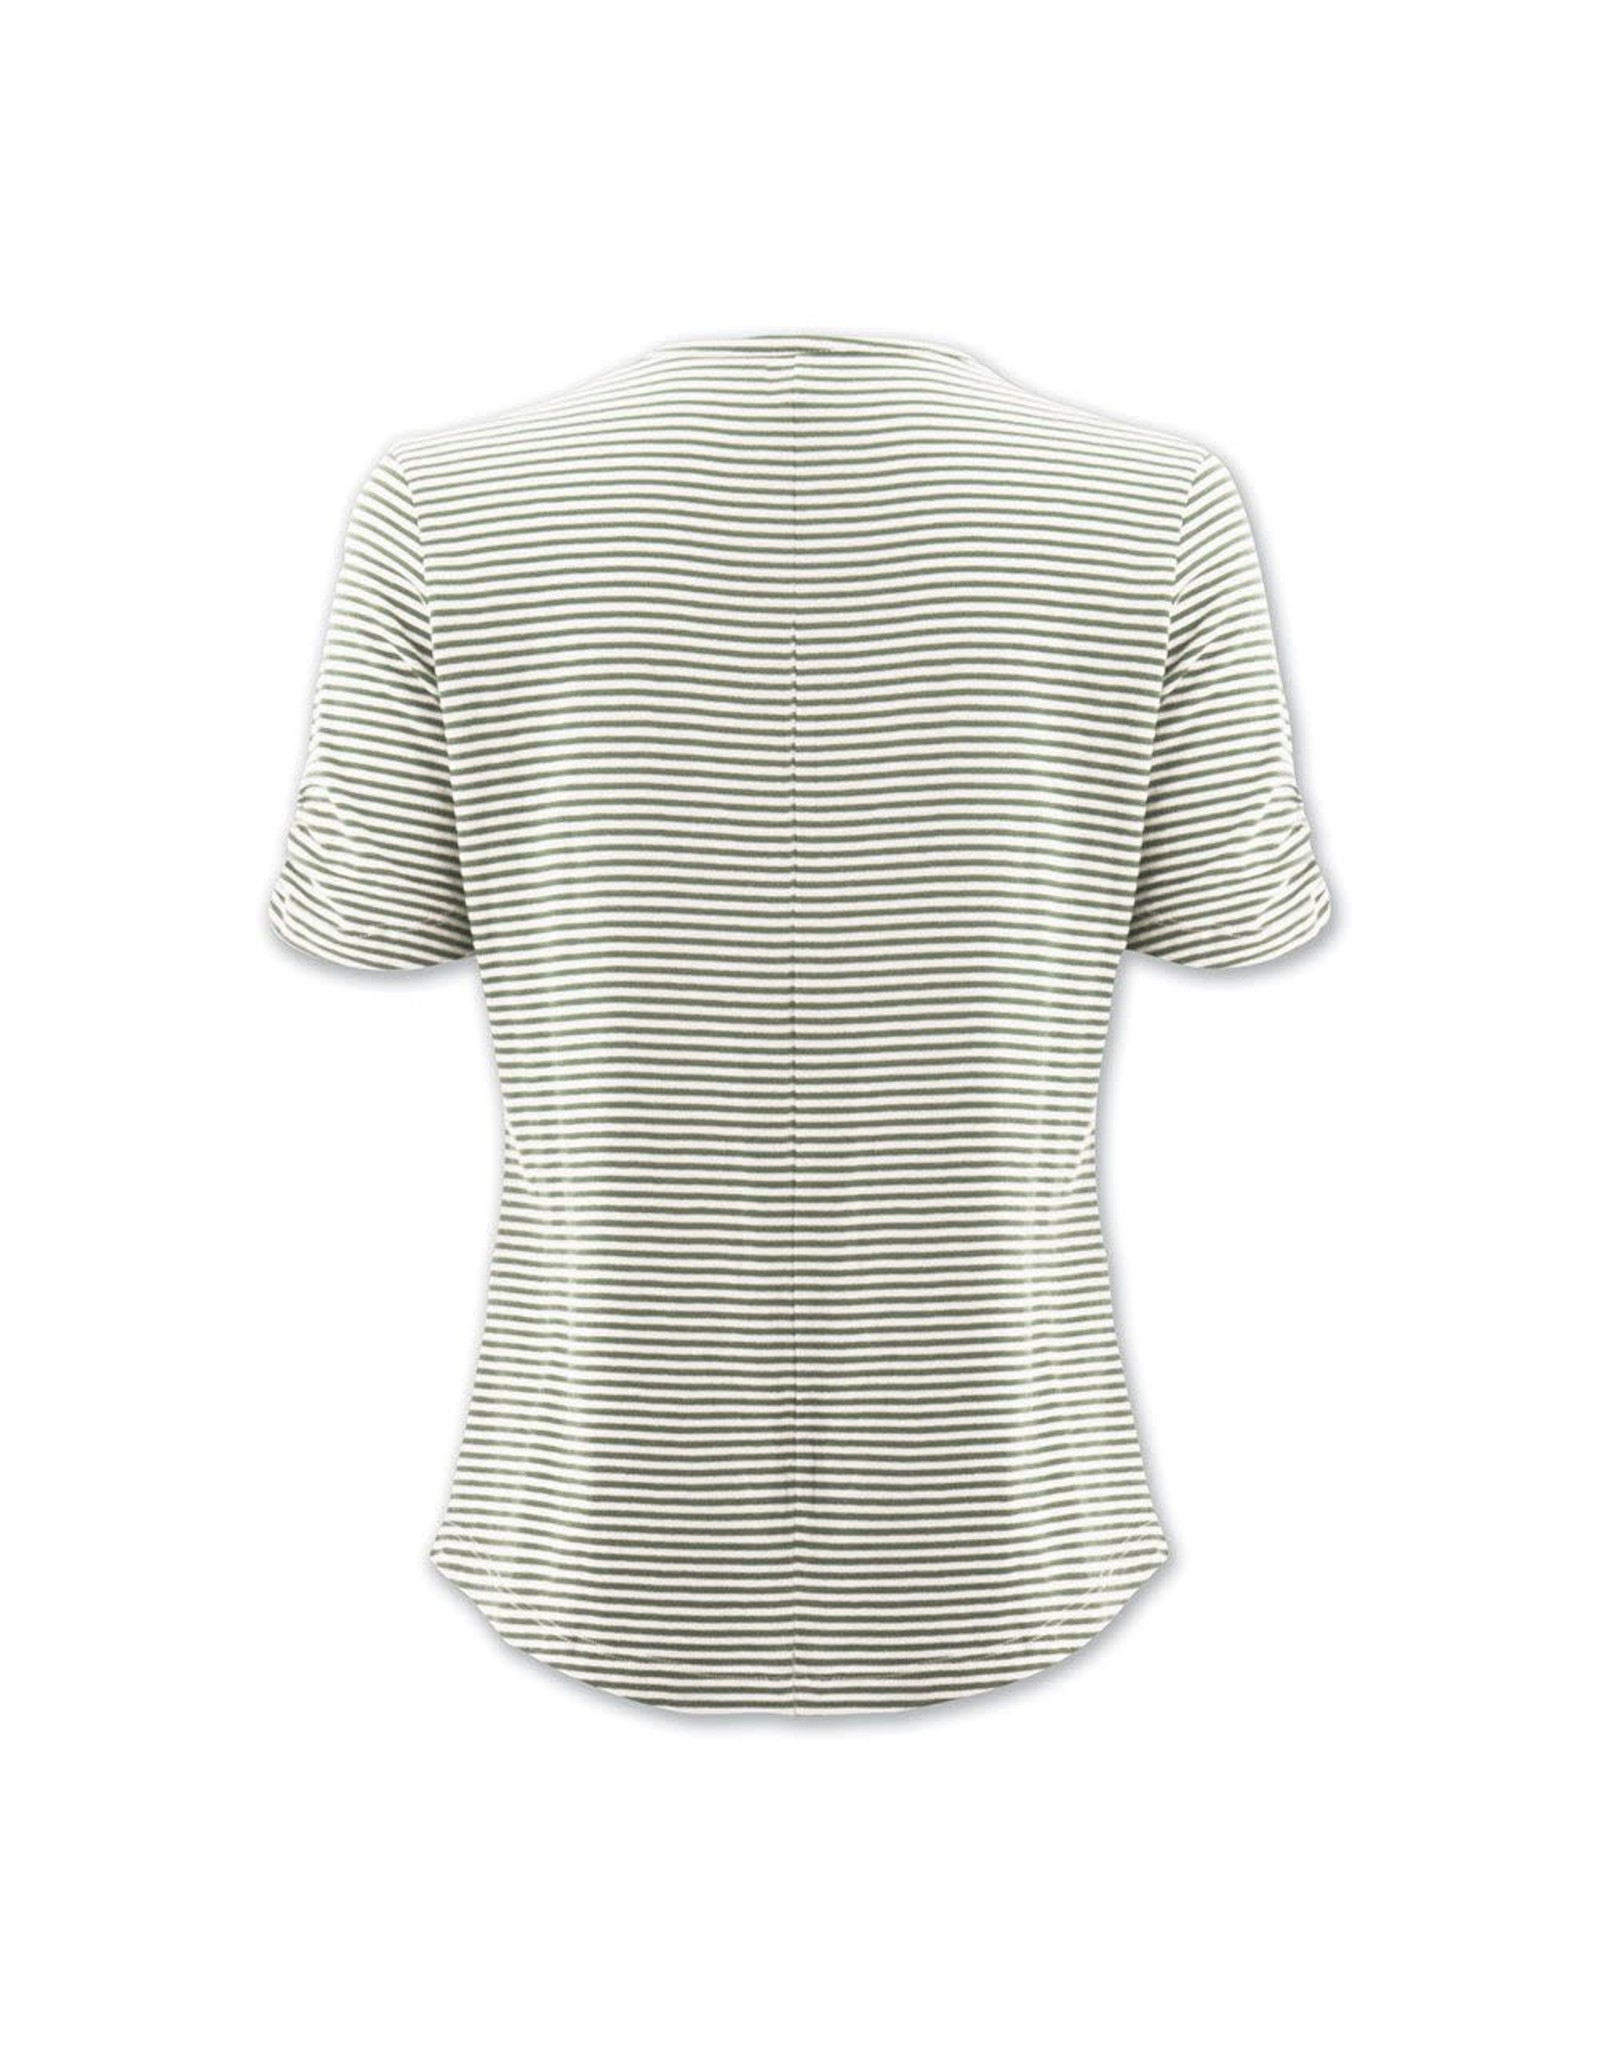 Aventura Green Striped Organic Cotton Top